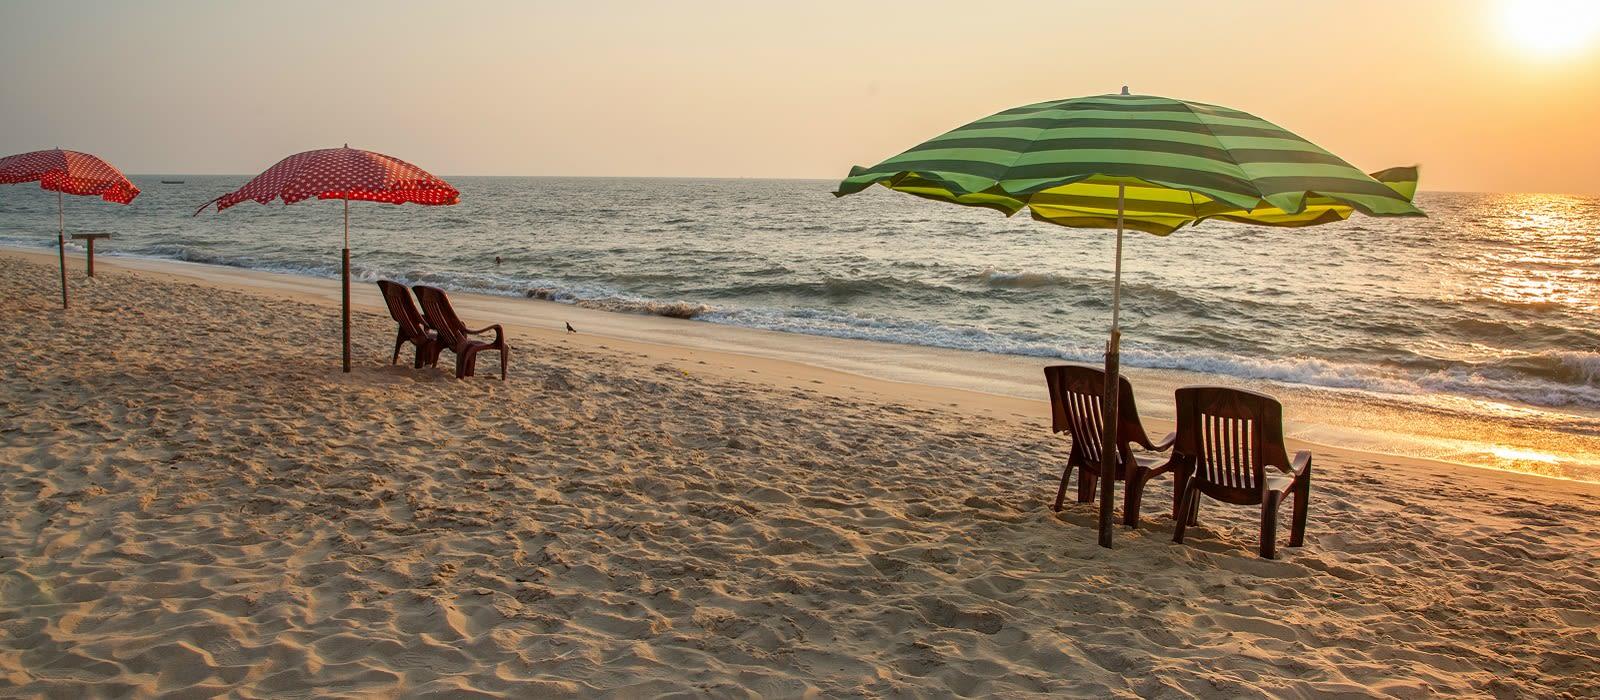 Classic Kerala: God's own Country Tour Trip 7